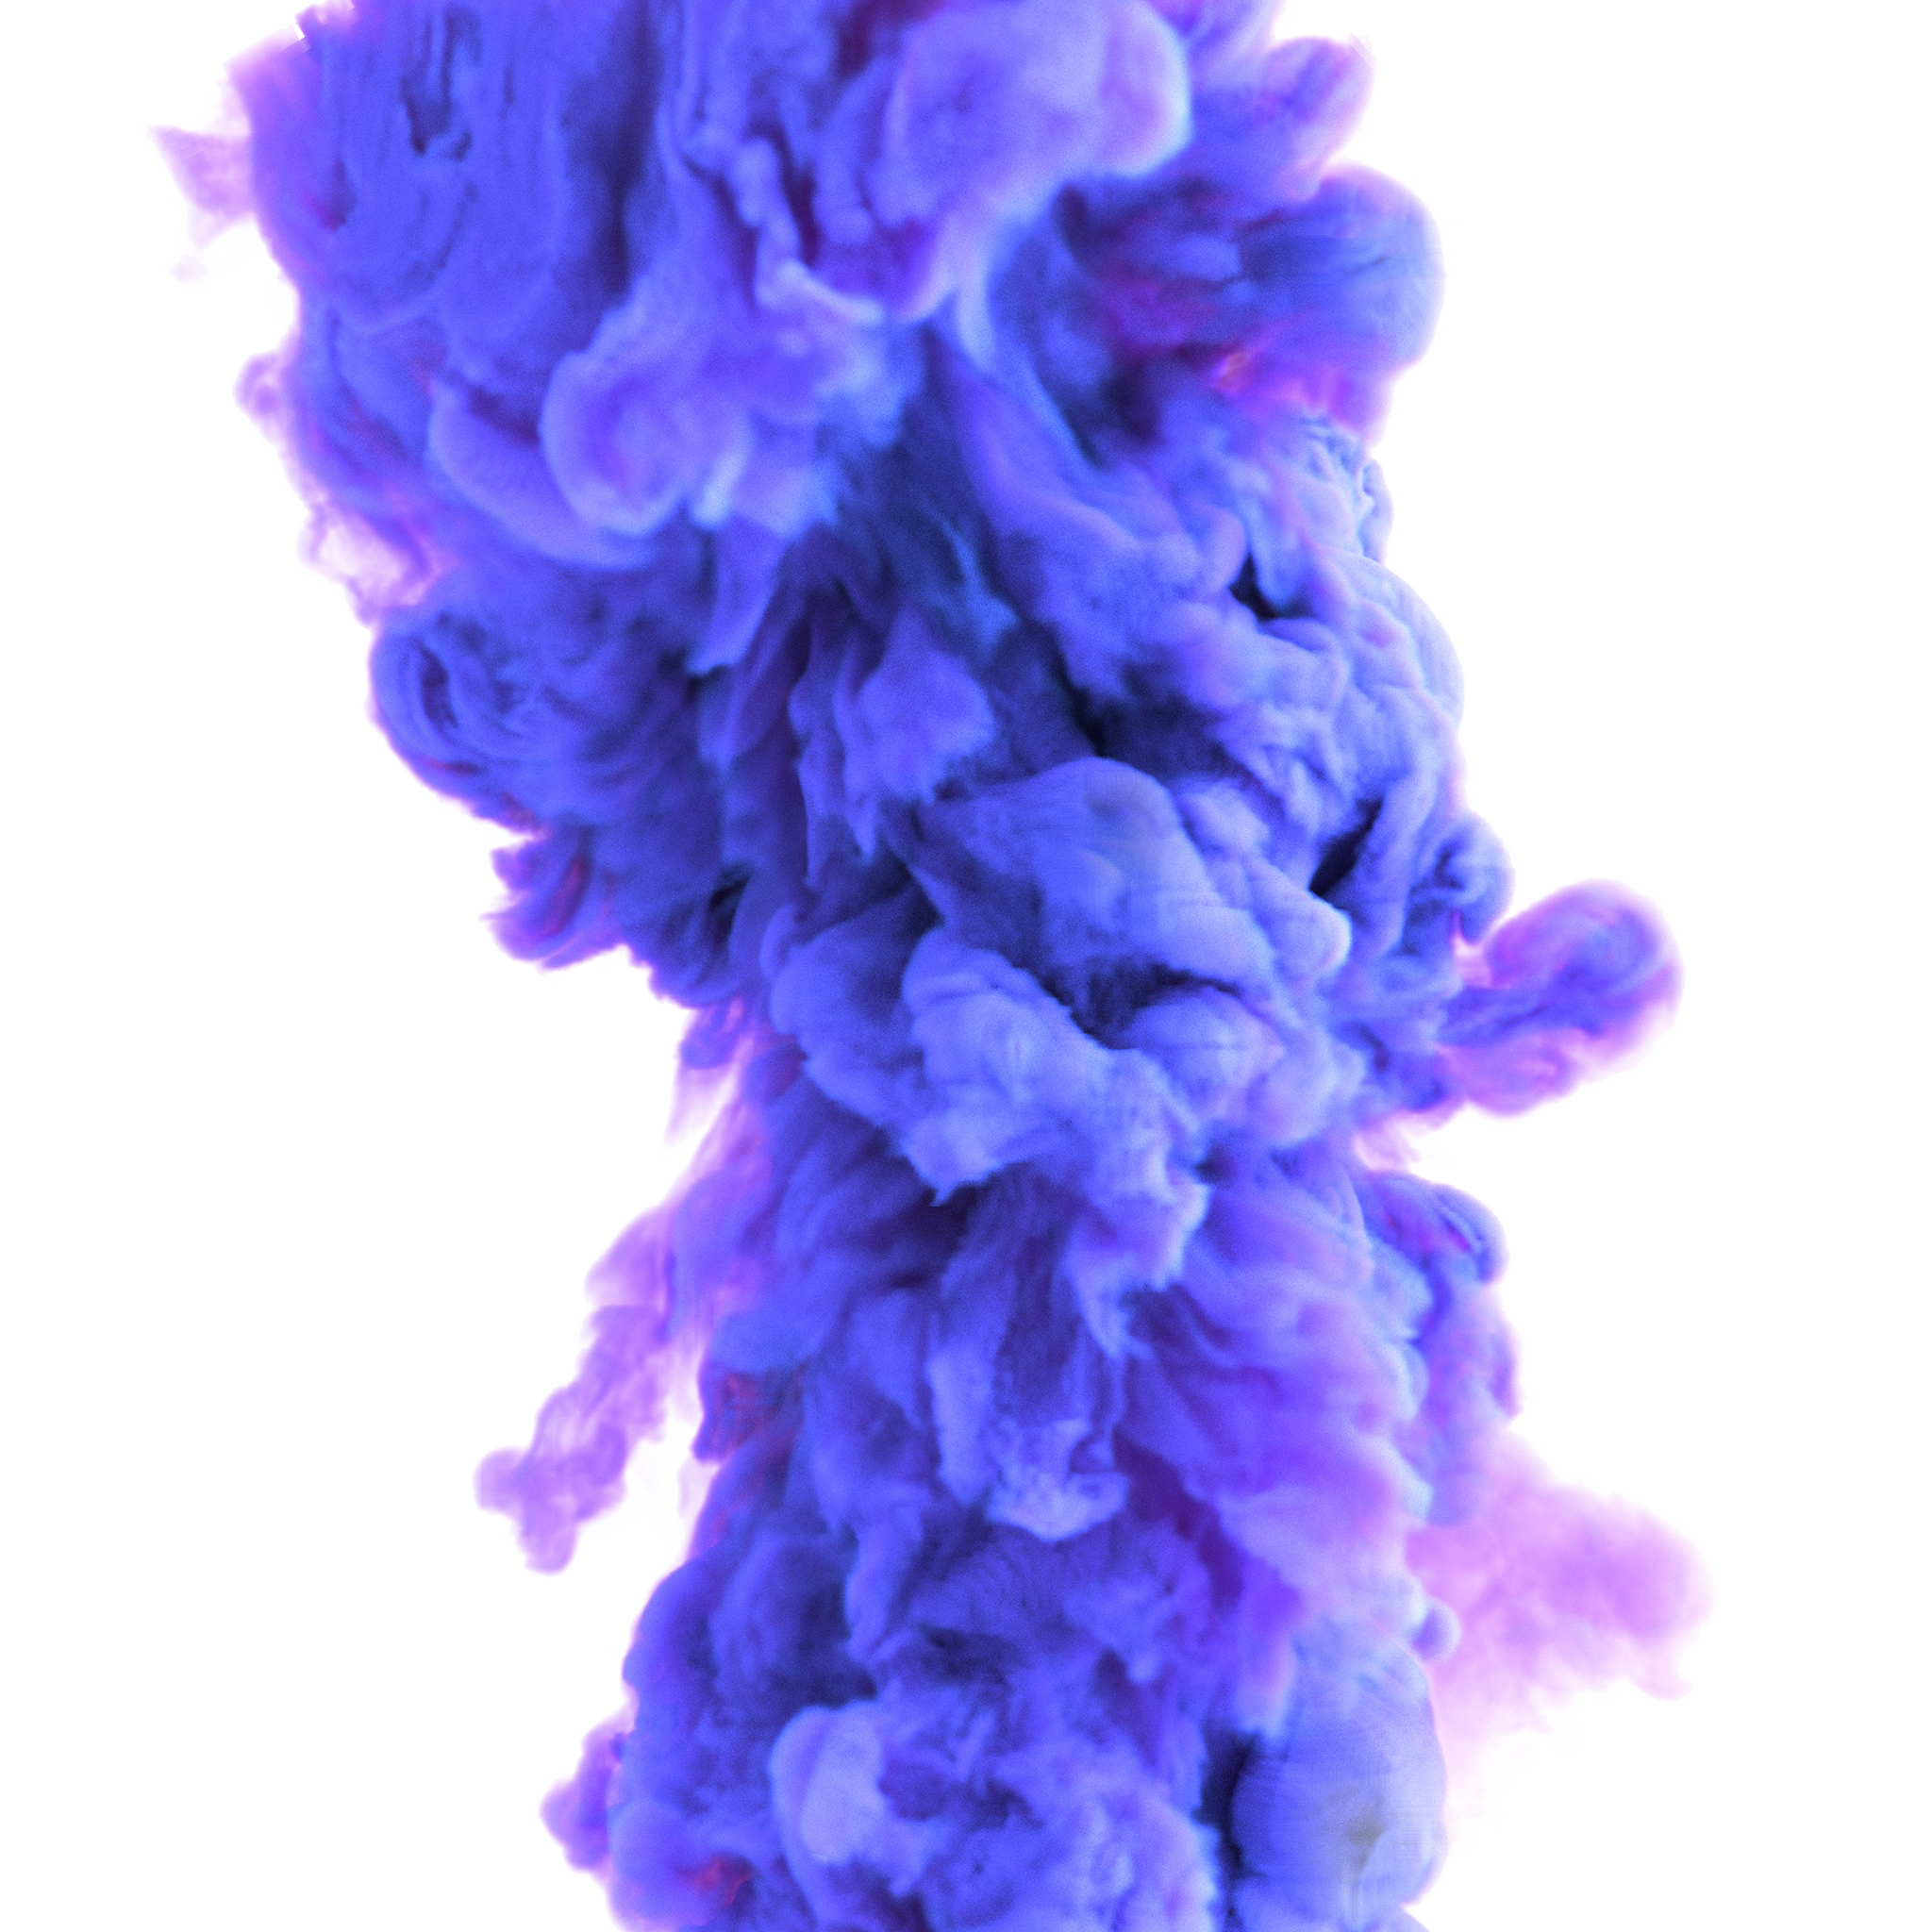 Purple Smoke PNG Background Image | PNG Arts